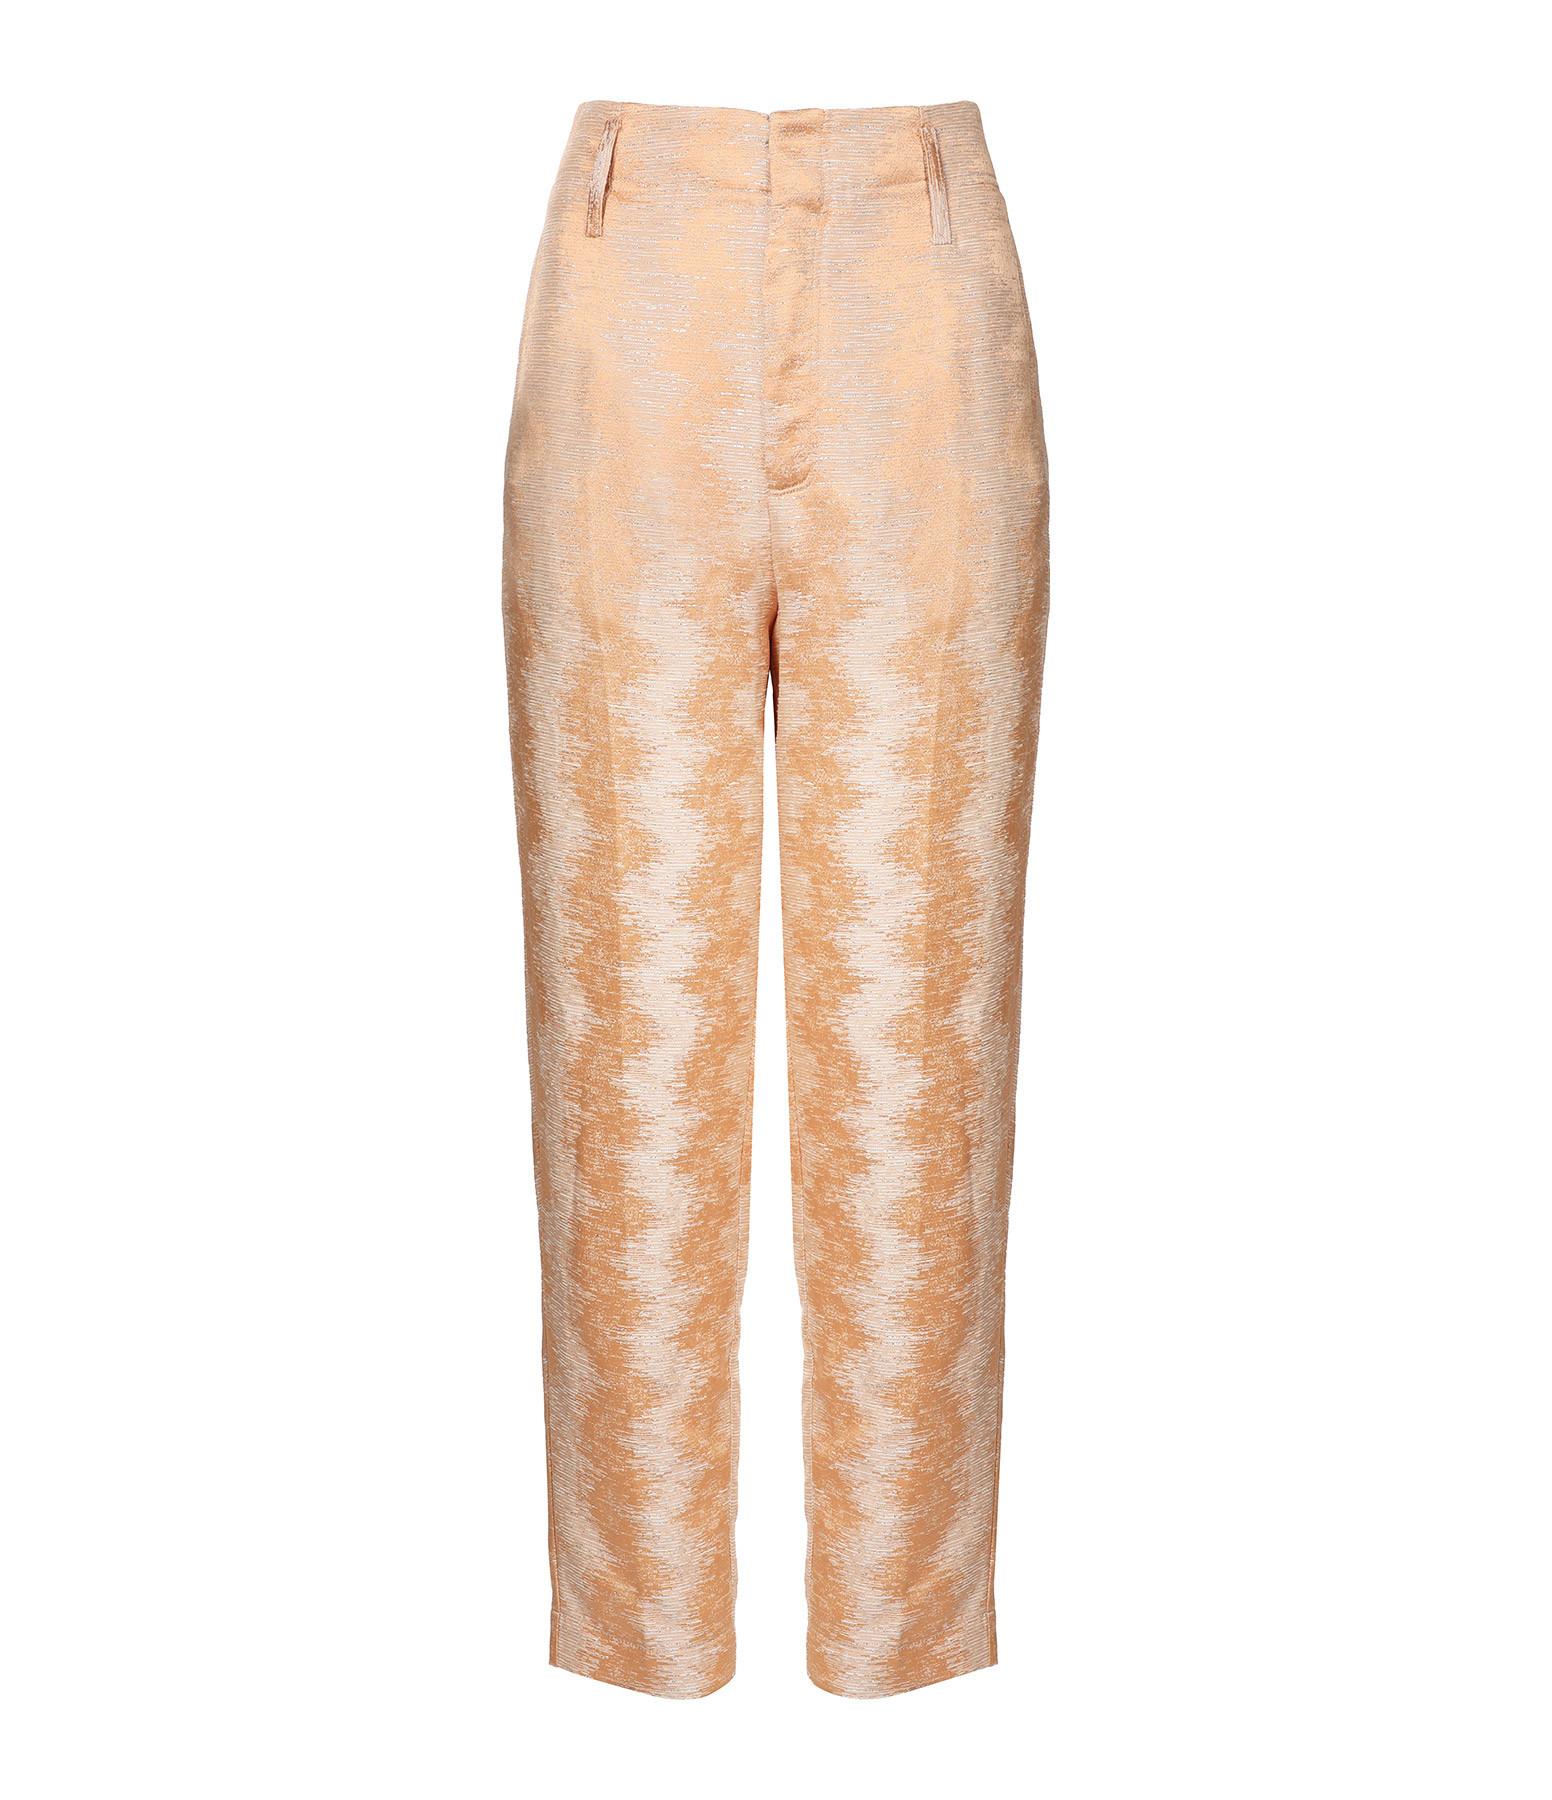 FORTE_FORTE - Pantalon Fluide Jacquard Terracotta